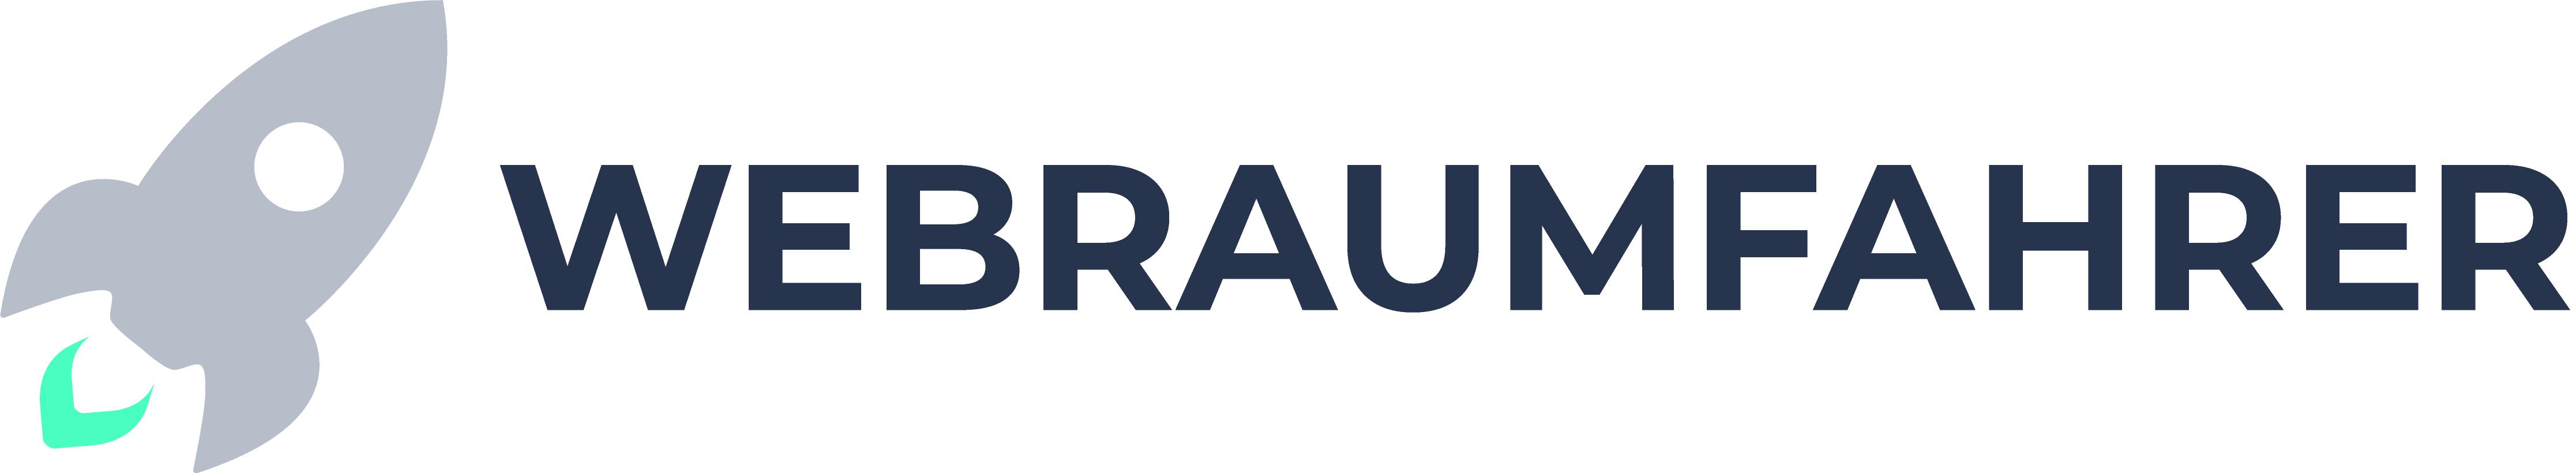 webraumfahrer_logo